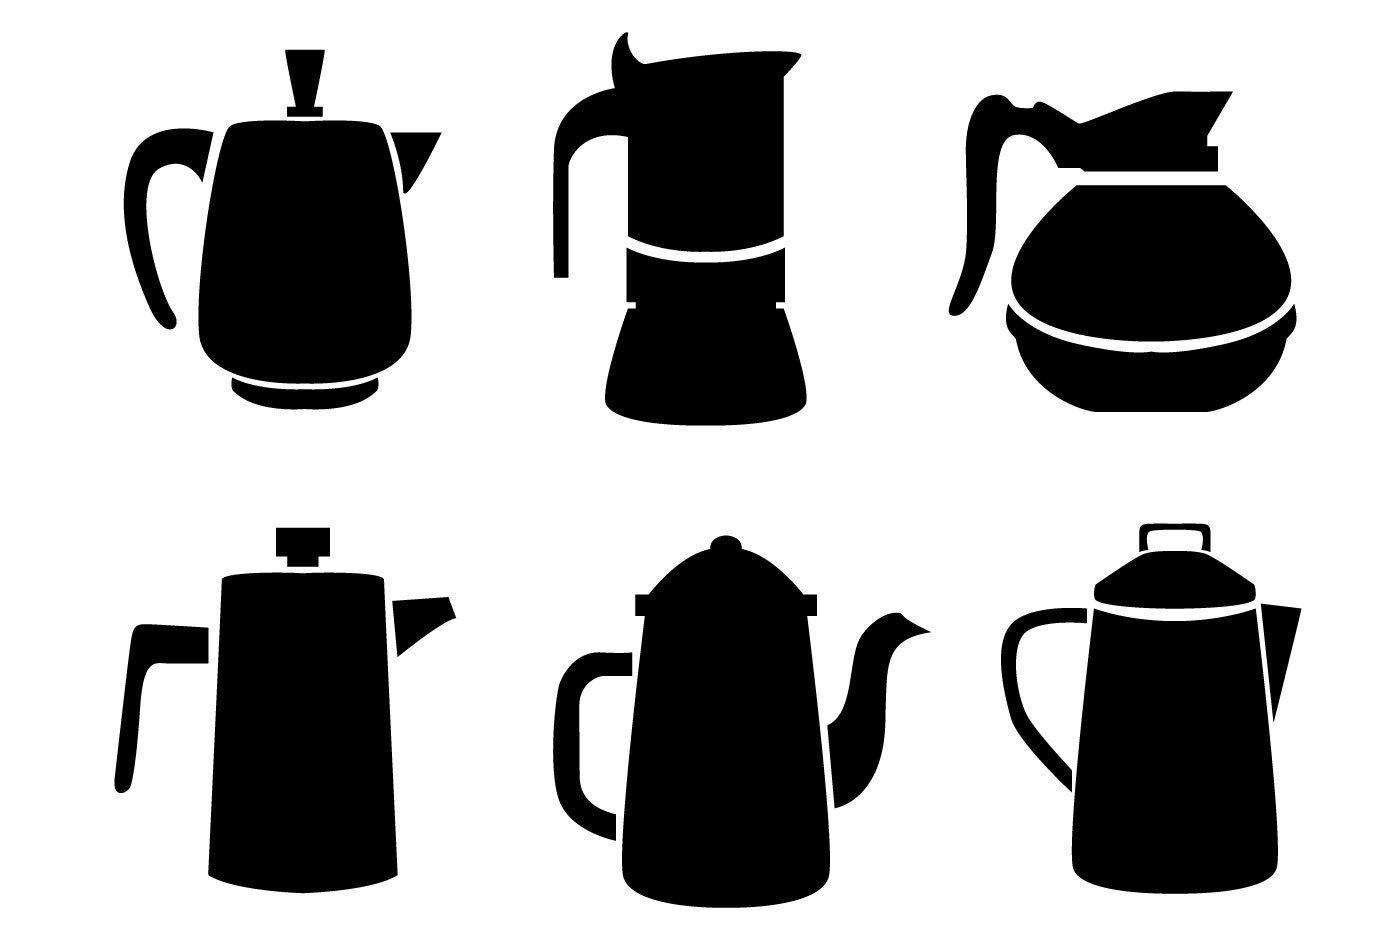 Чайники, кофейники, турки